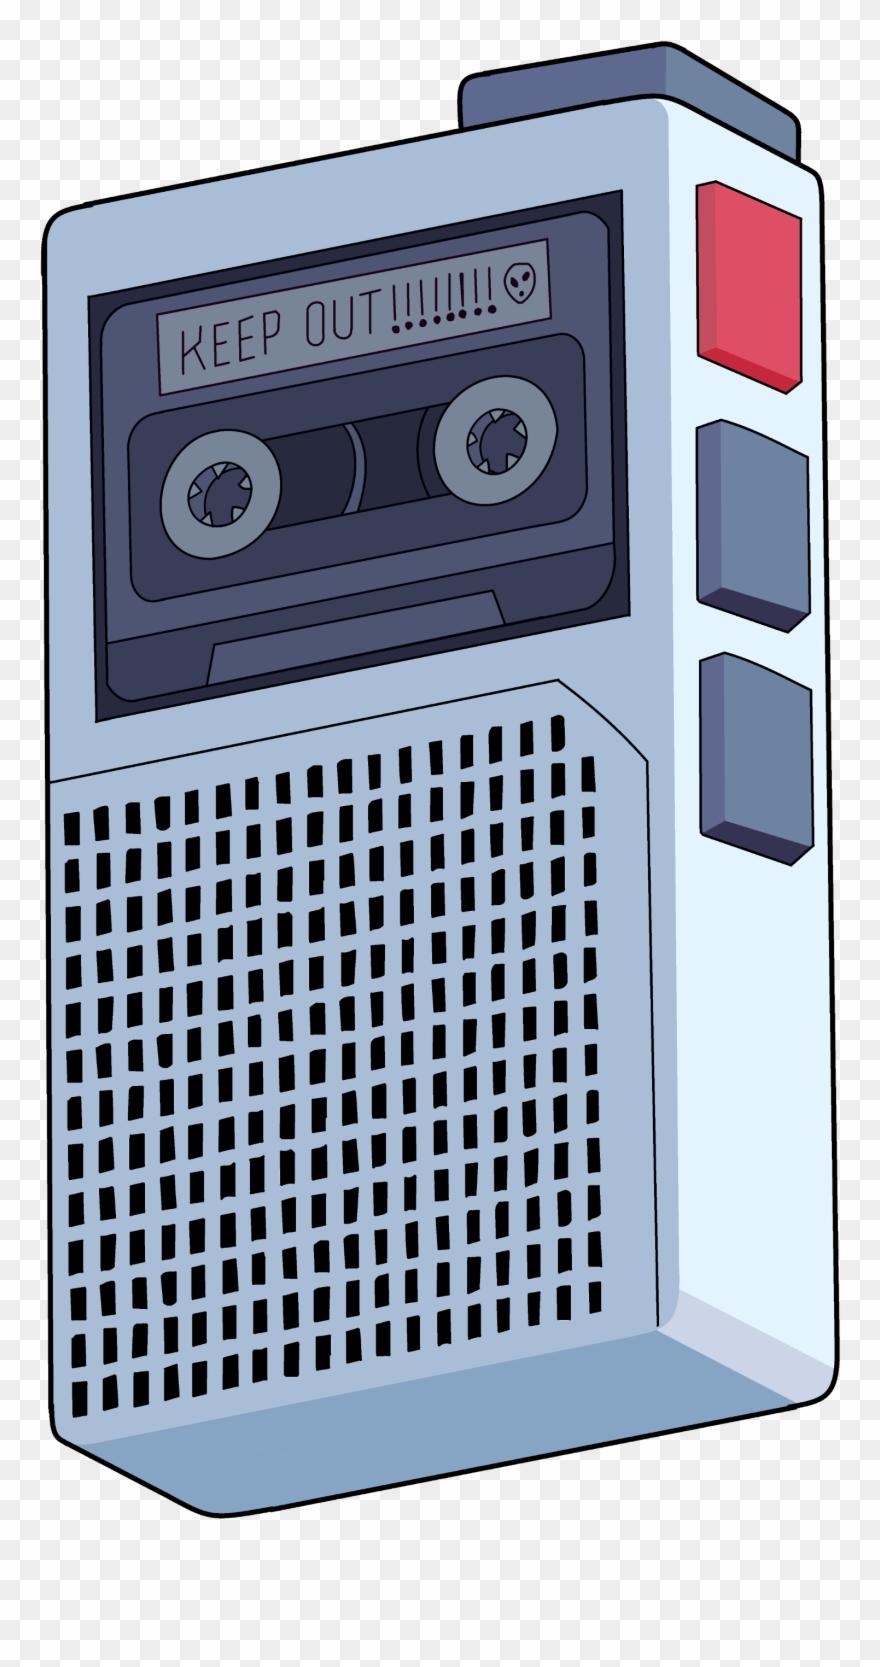 Peridot S Voice Recorder Transparent Background.